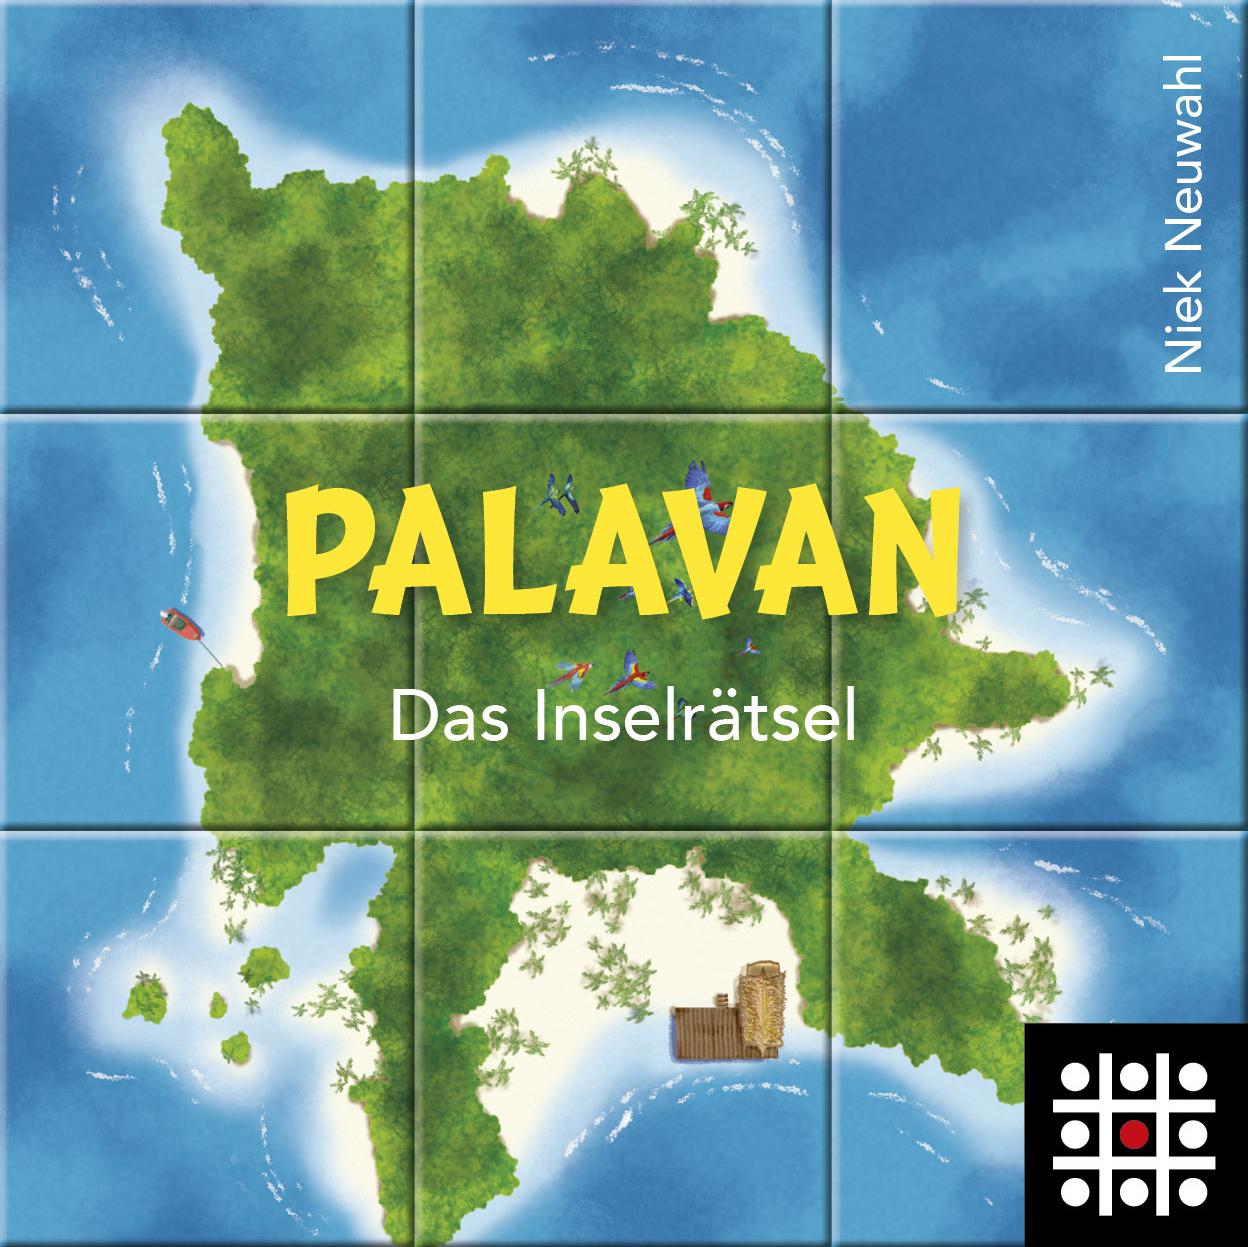 Palavan Decklaying Game